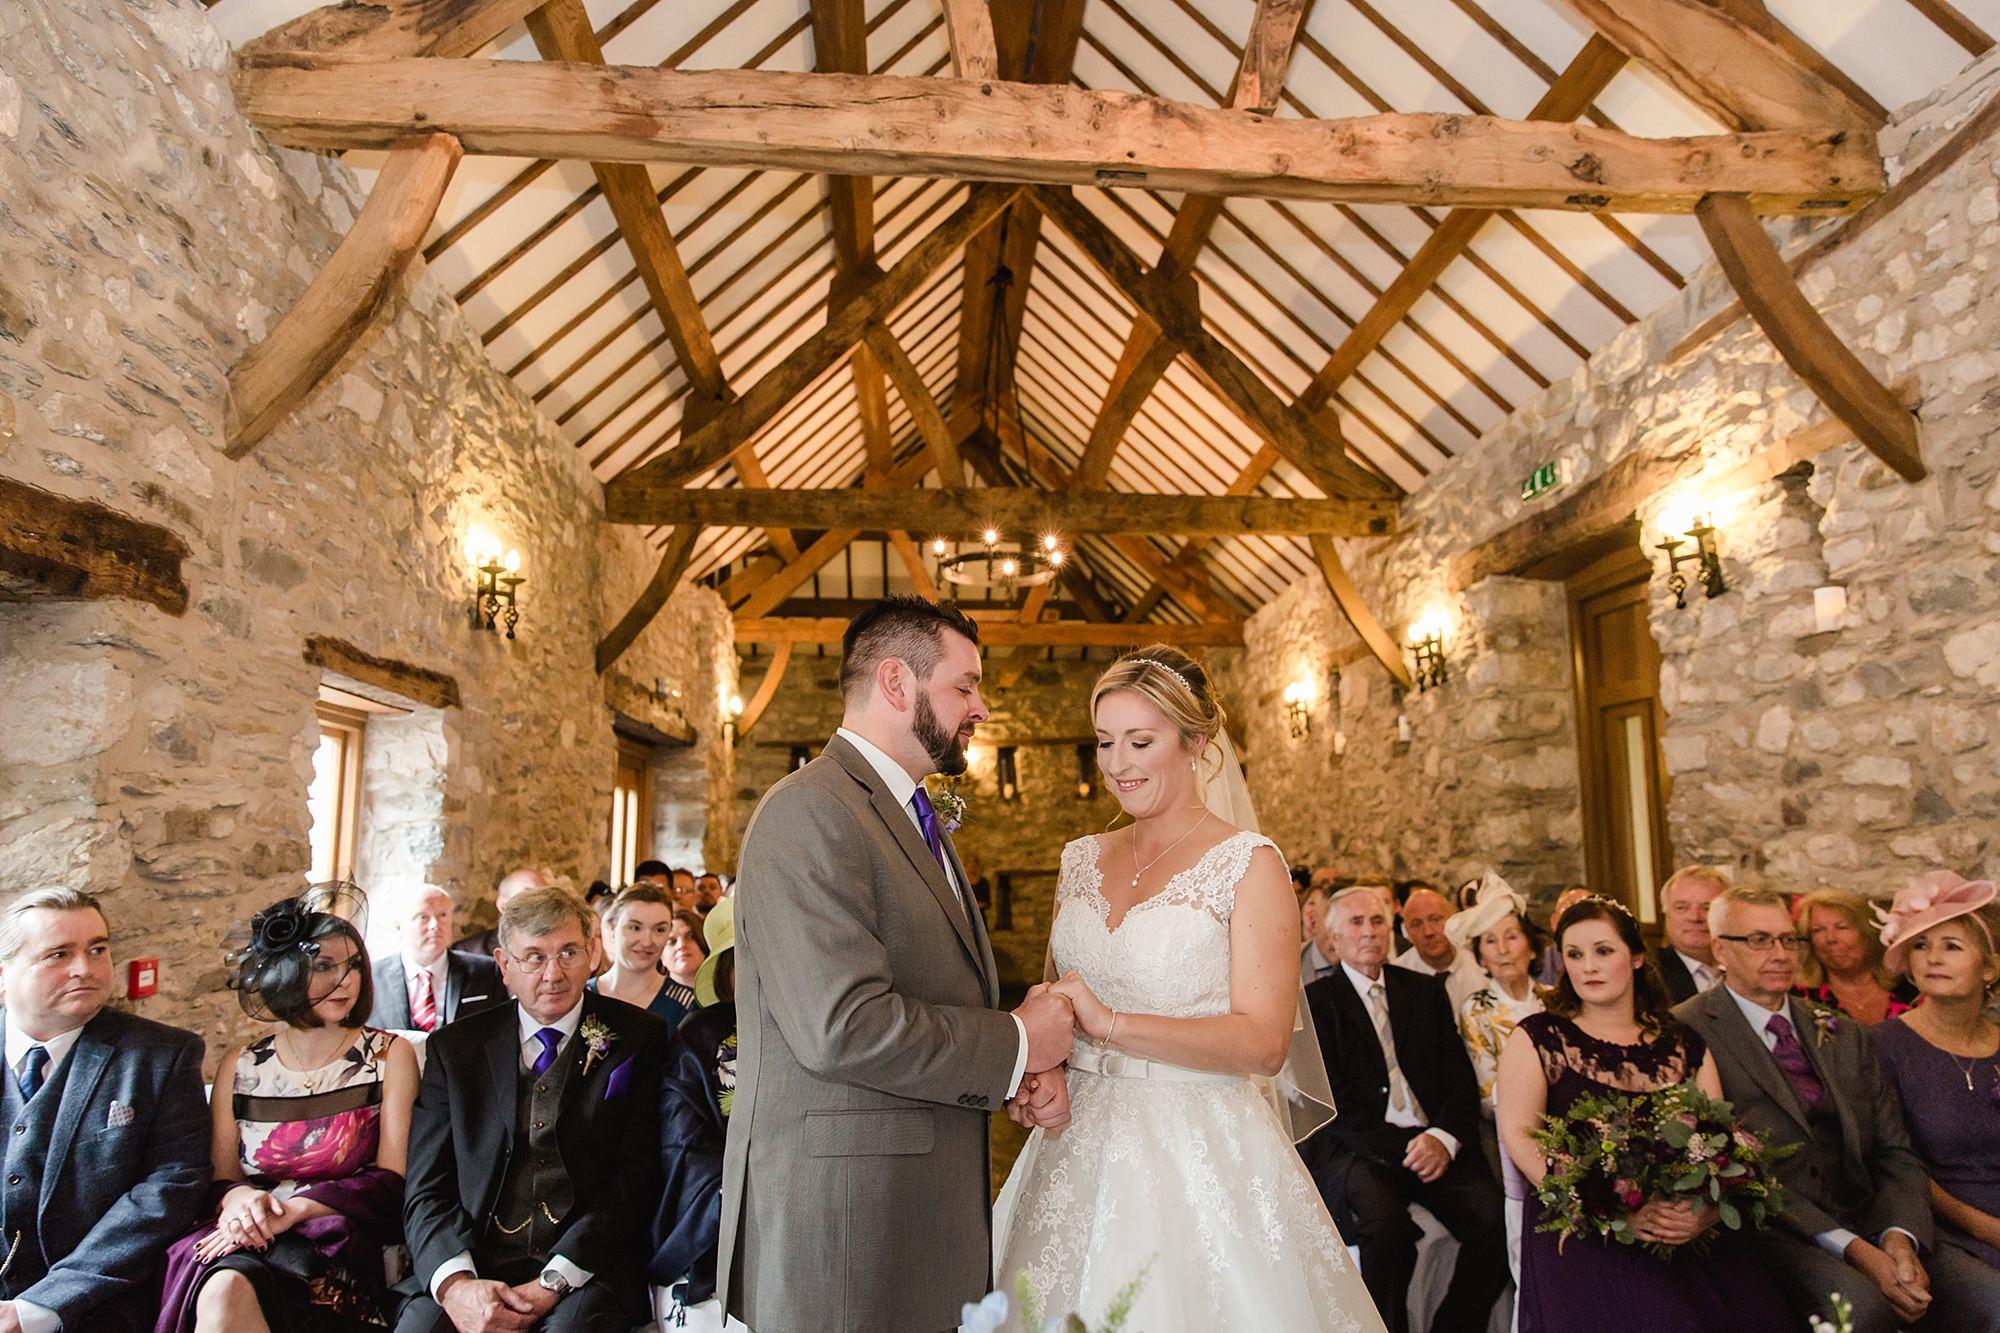 A fun wedding at Plas Isaf - bride and groom exchange rings